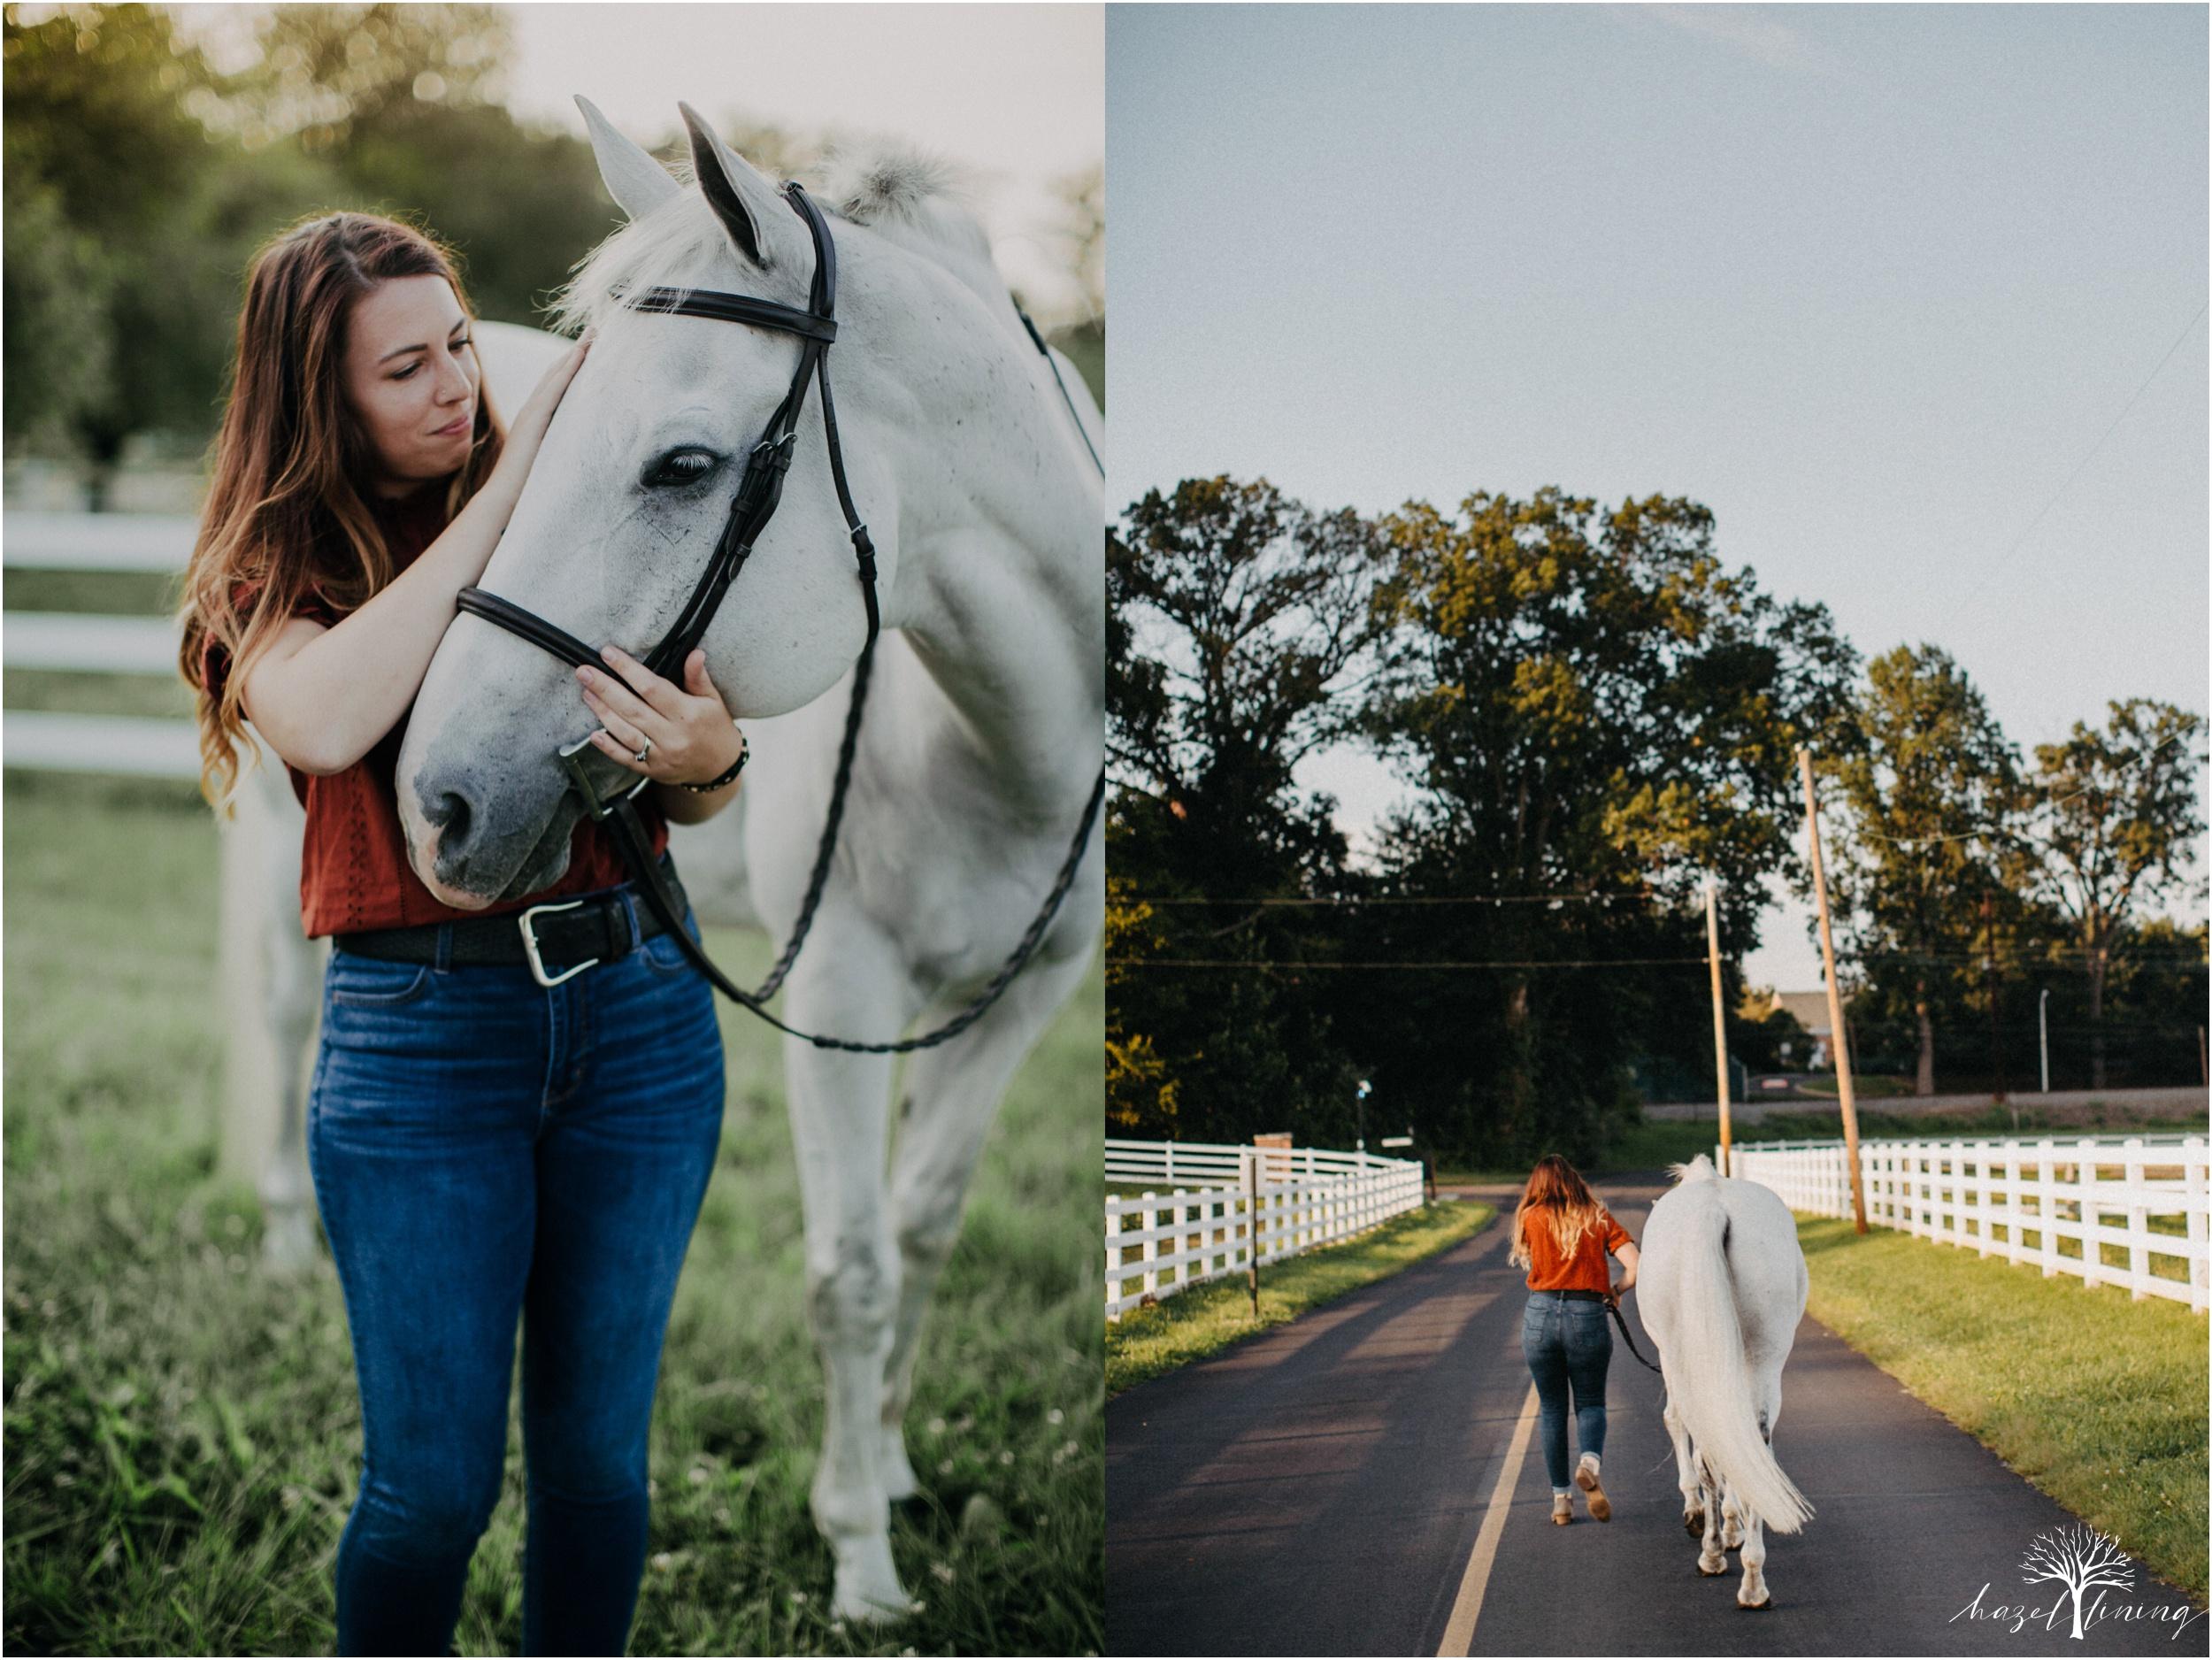 taylor-adams-and-horse-delaware-valley-university-delval-summer-equestrian-portrait-session-hazel-lining-photography-destination-elopement-wedding-engagement-photography_0012.jpg